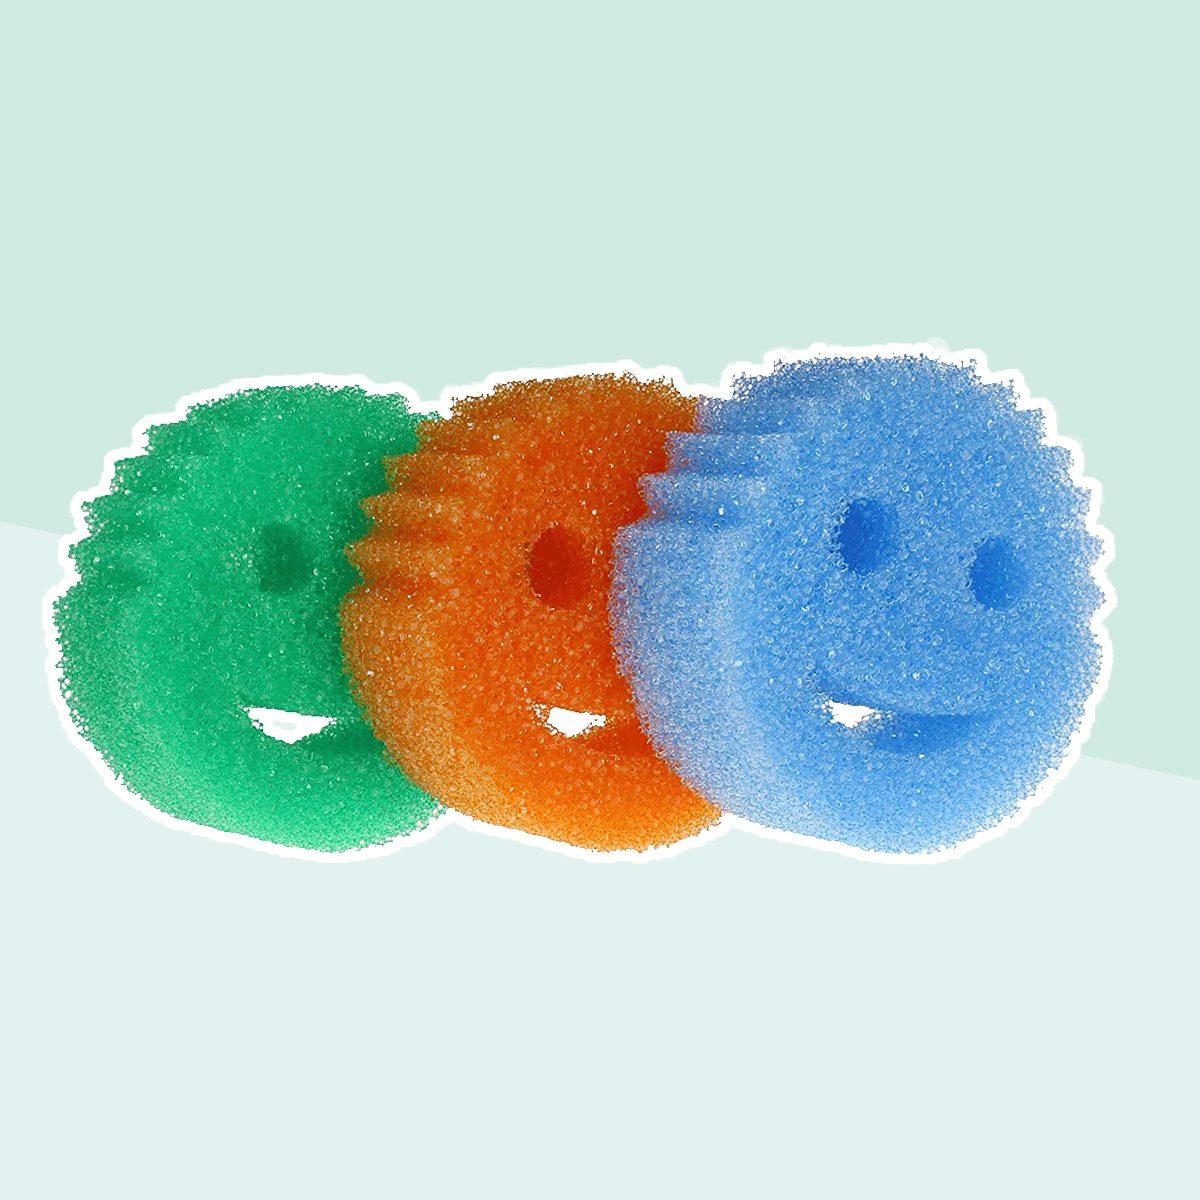 Scrub Daddy - Original Temperature Controlled Colored Scrubber - Scratch-Free & Odor Resistant - 6 Count